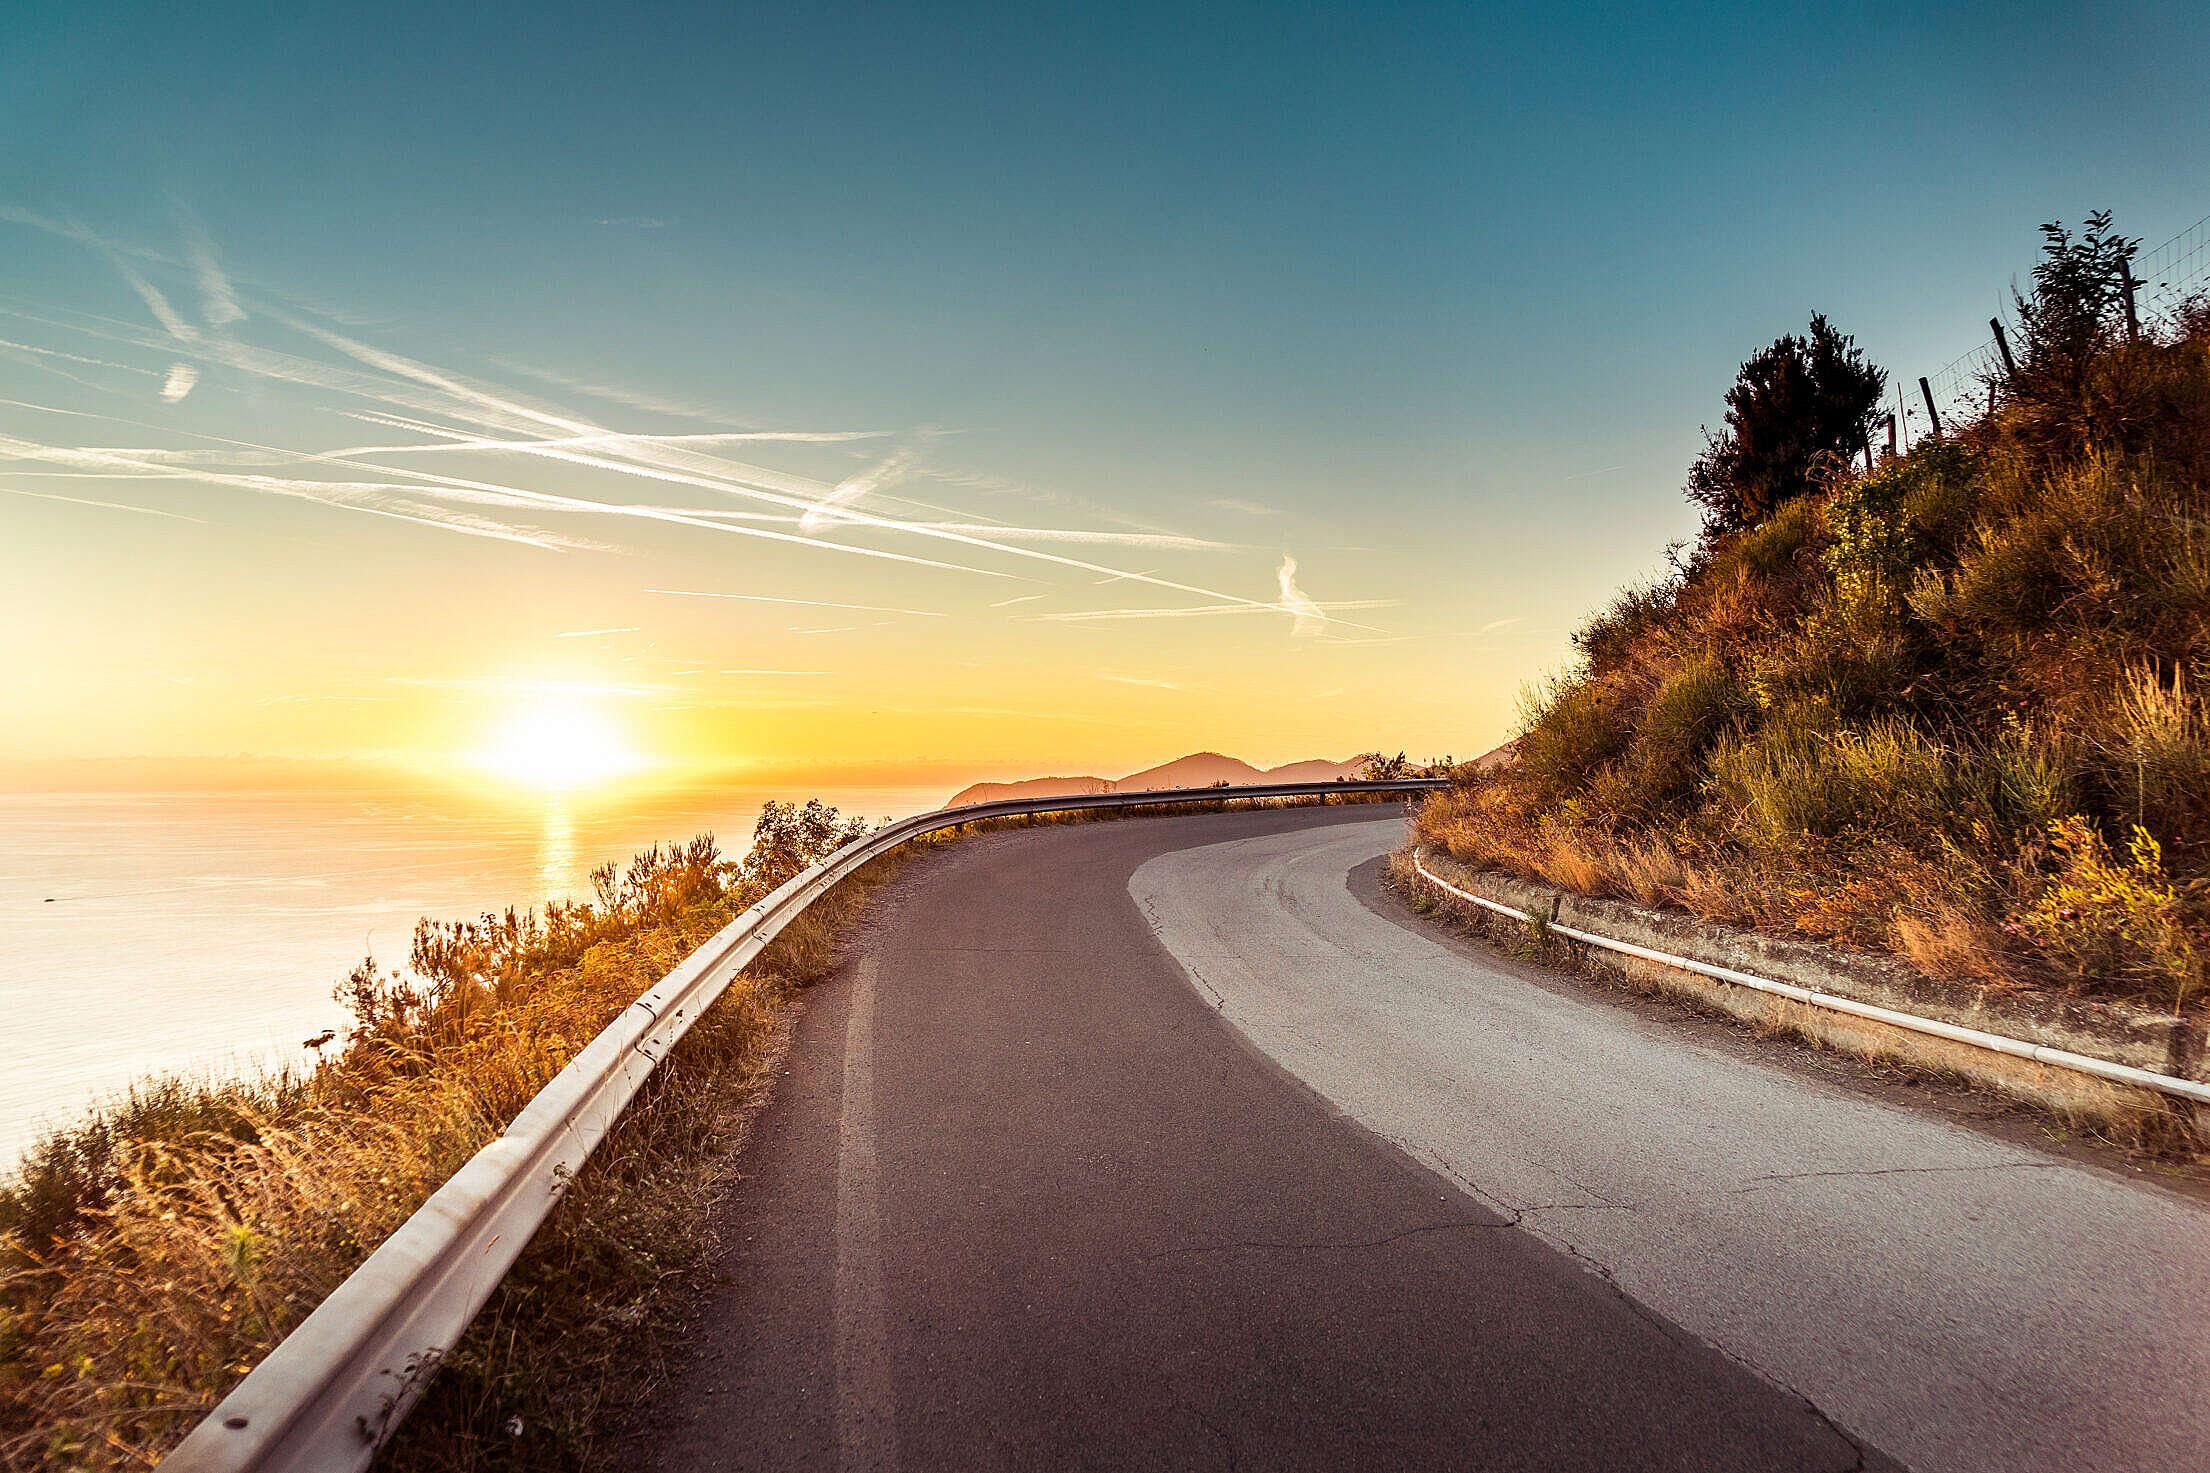 Coastline Sunset Road Free Stock Photo